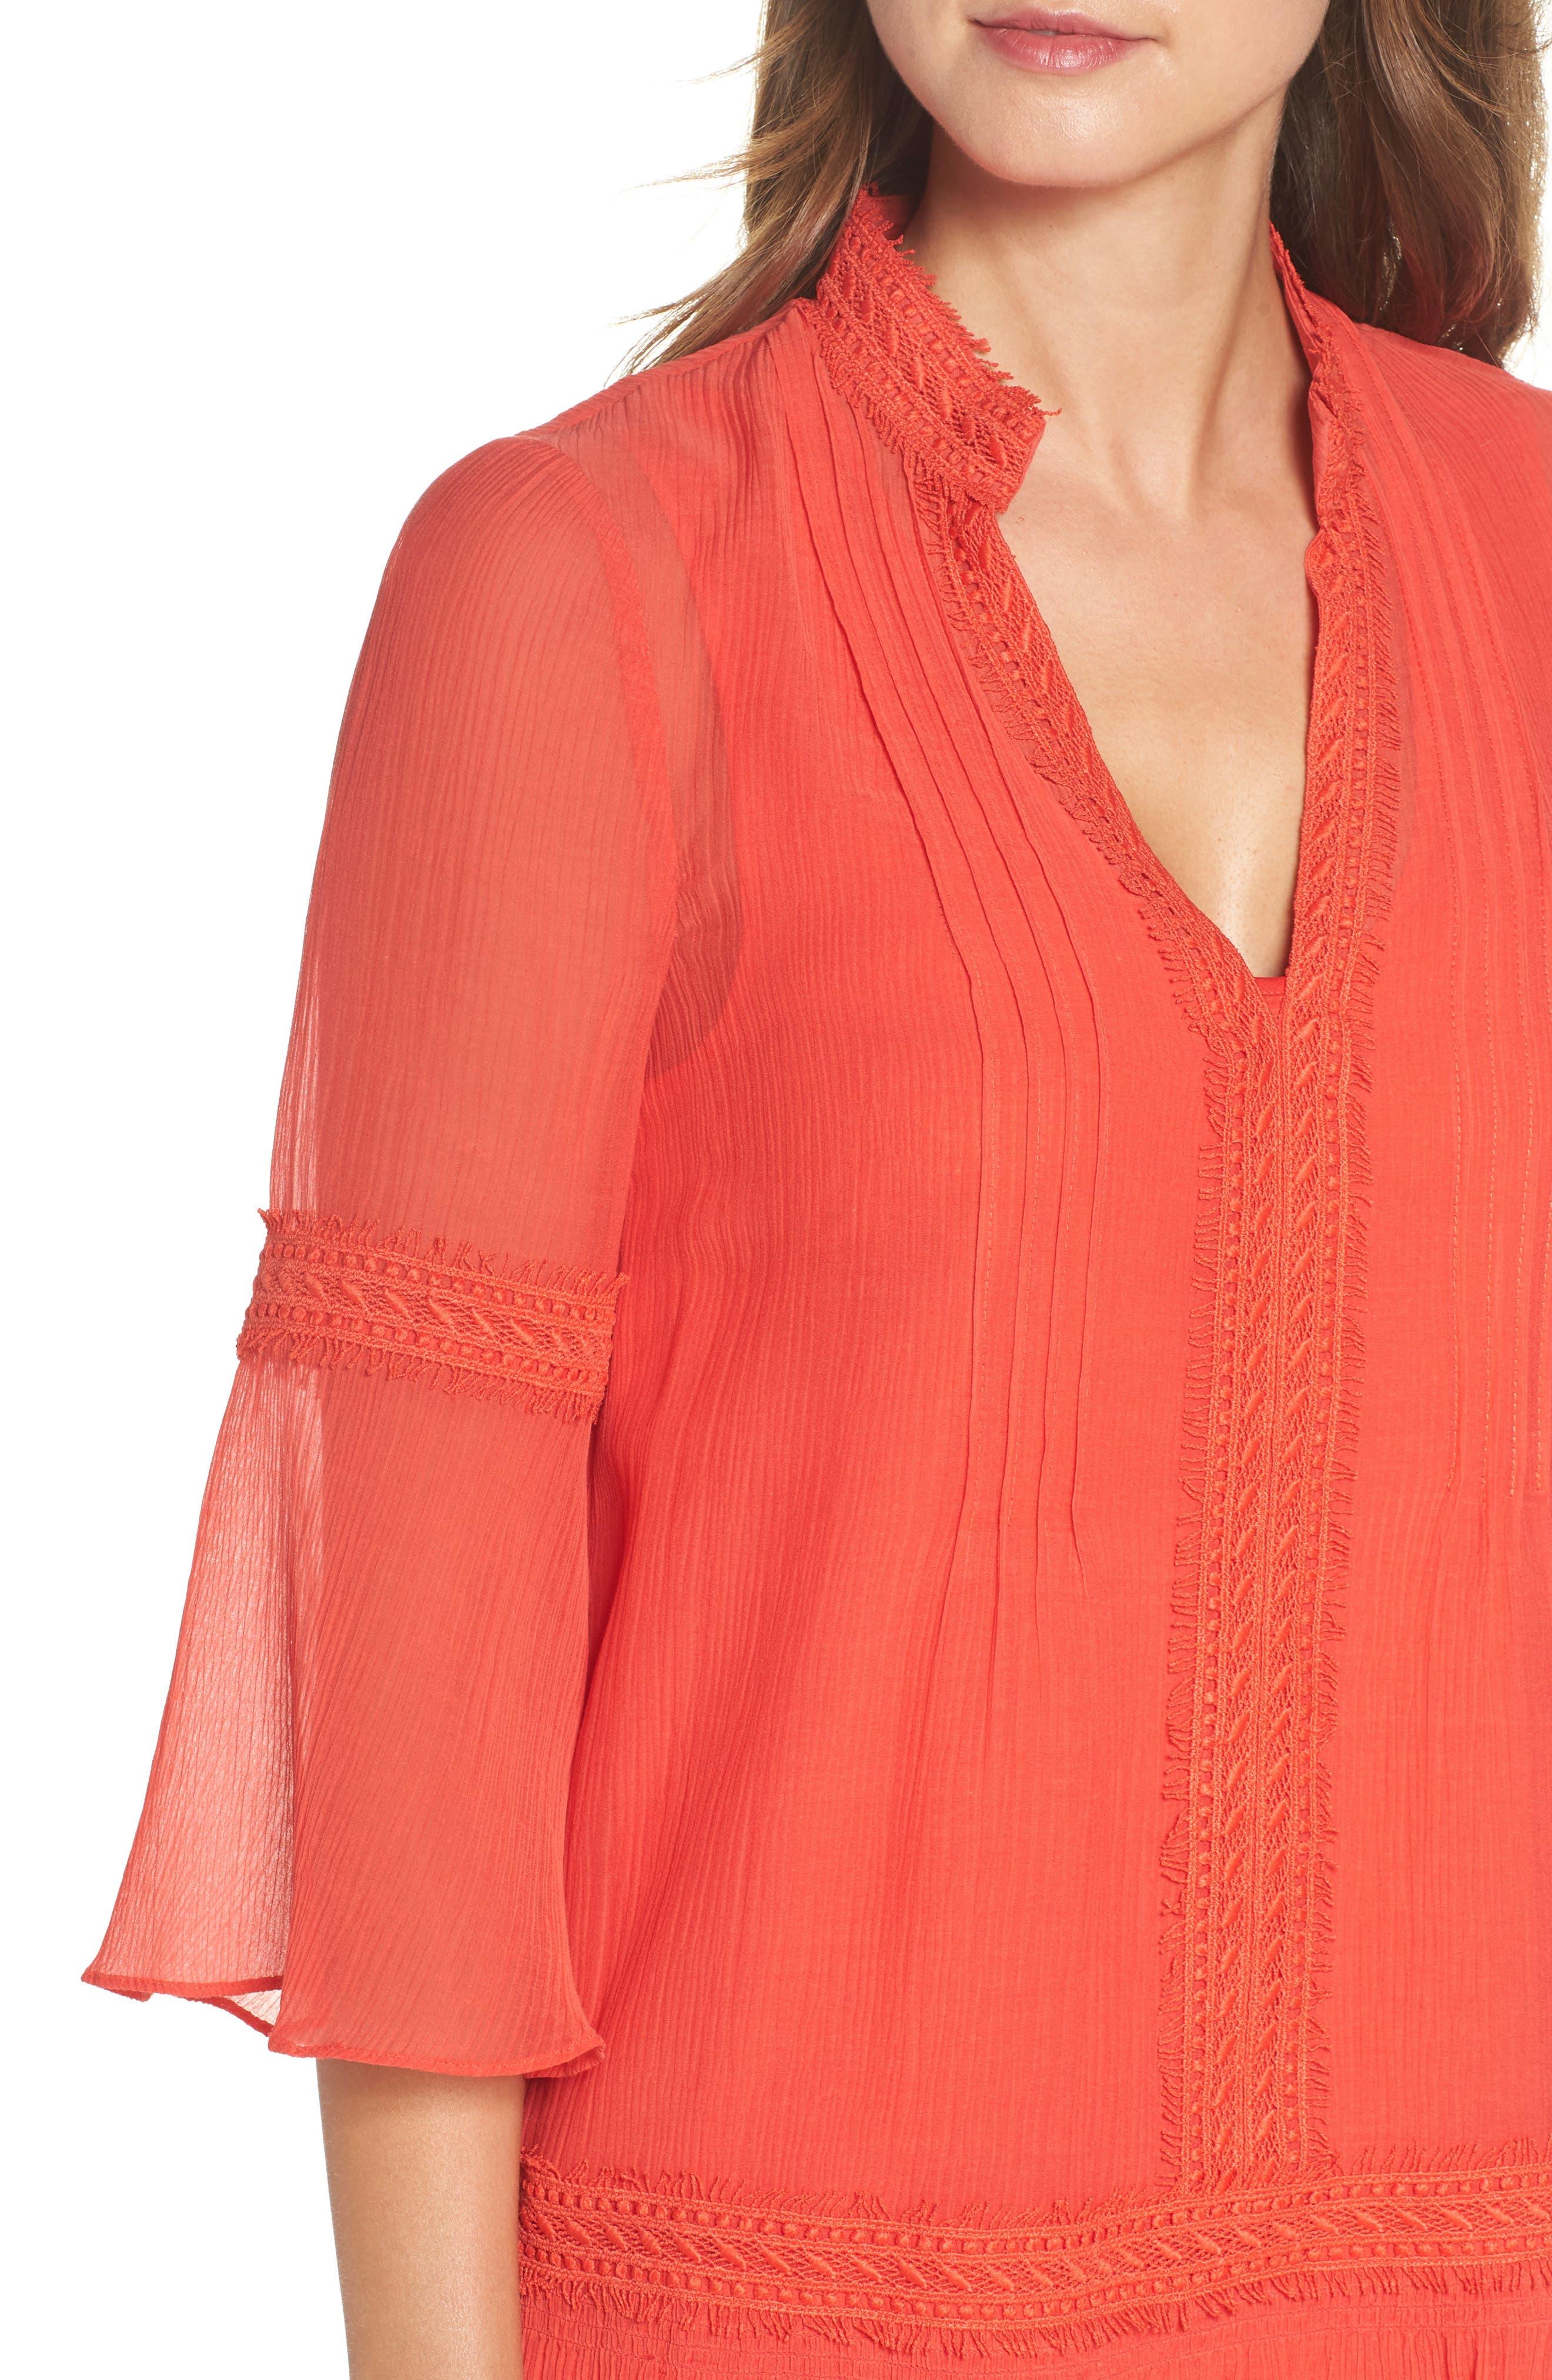 Mala Crinkle Shift Dress,                             Alternate thumbnail 4, color,                             Strawberry